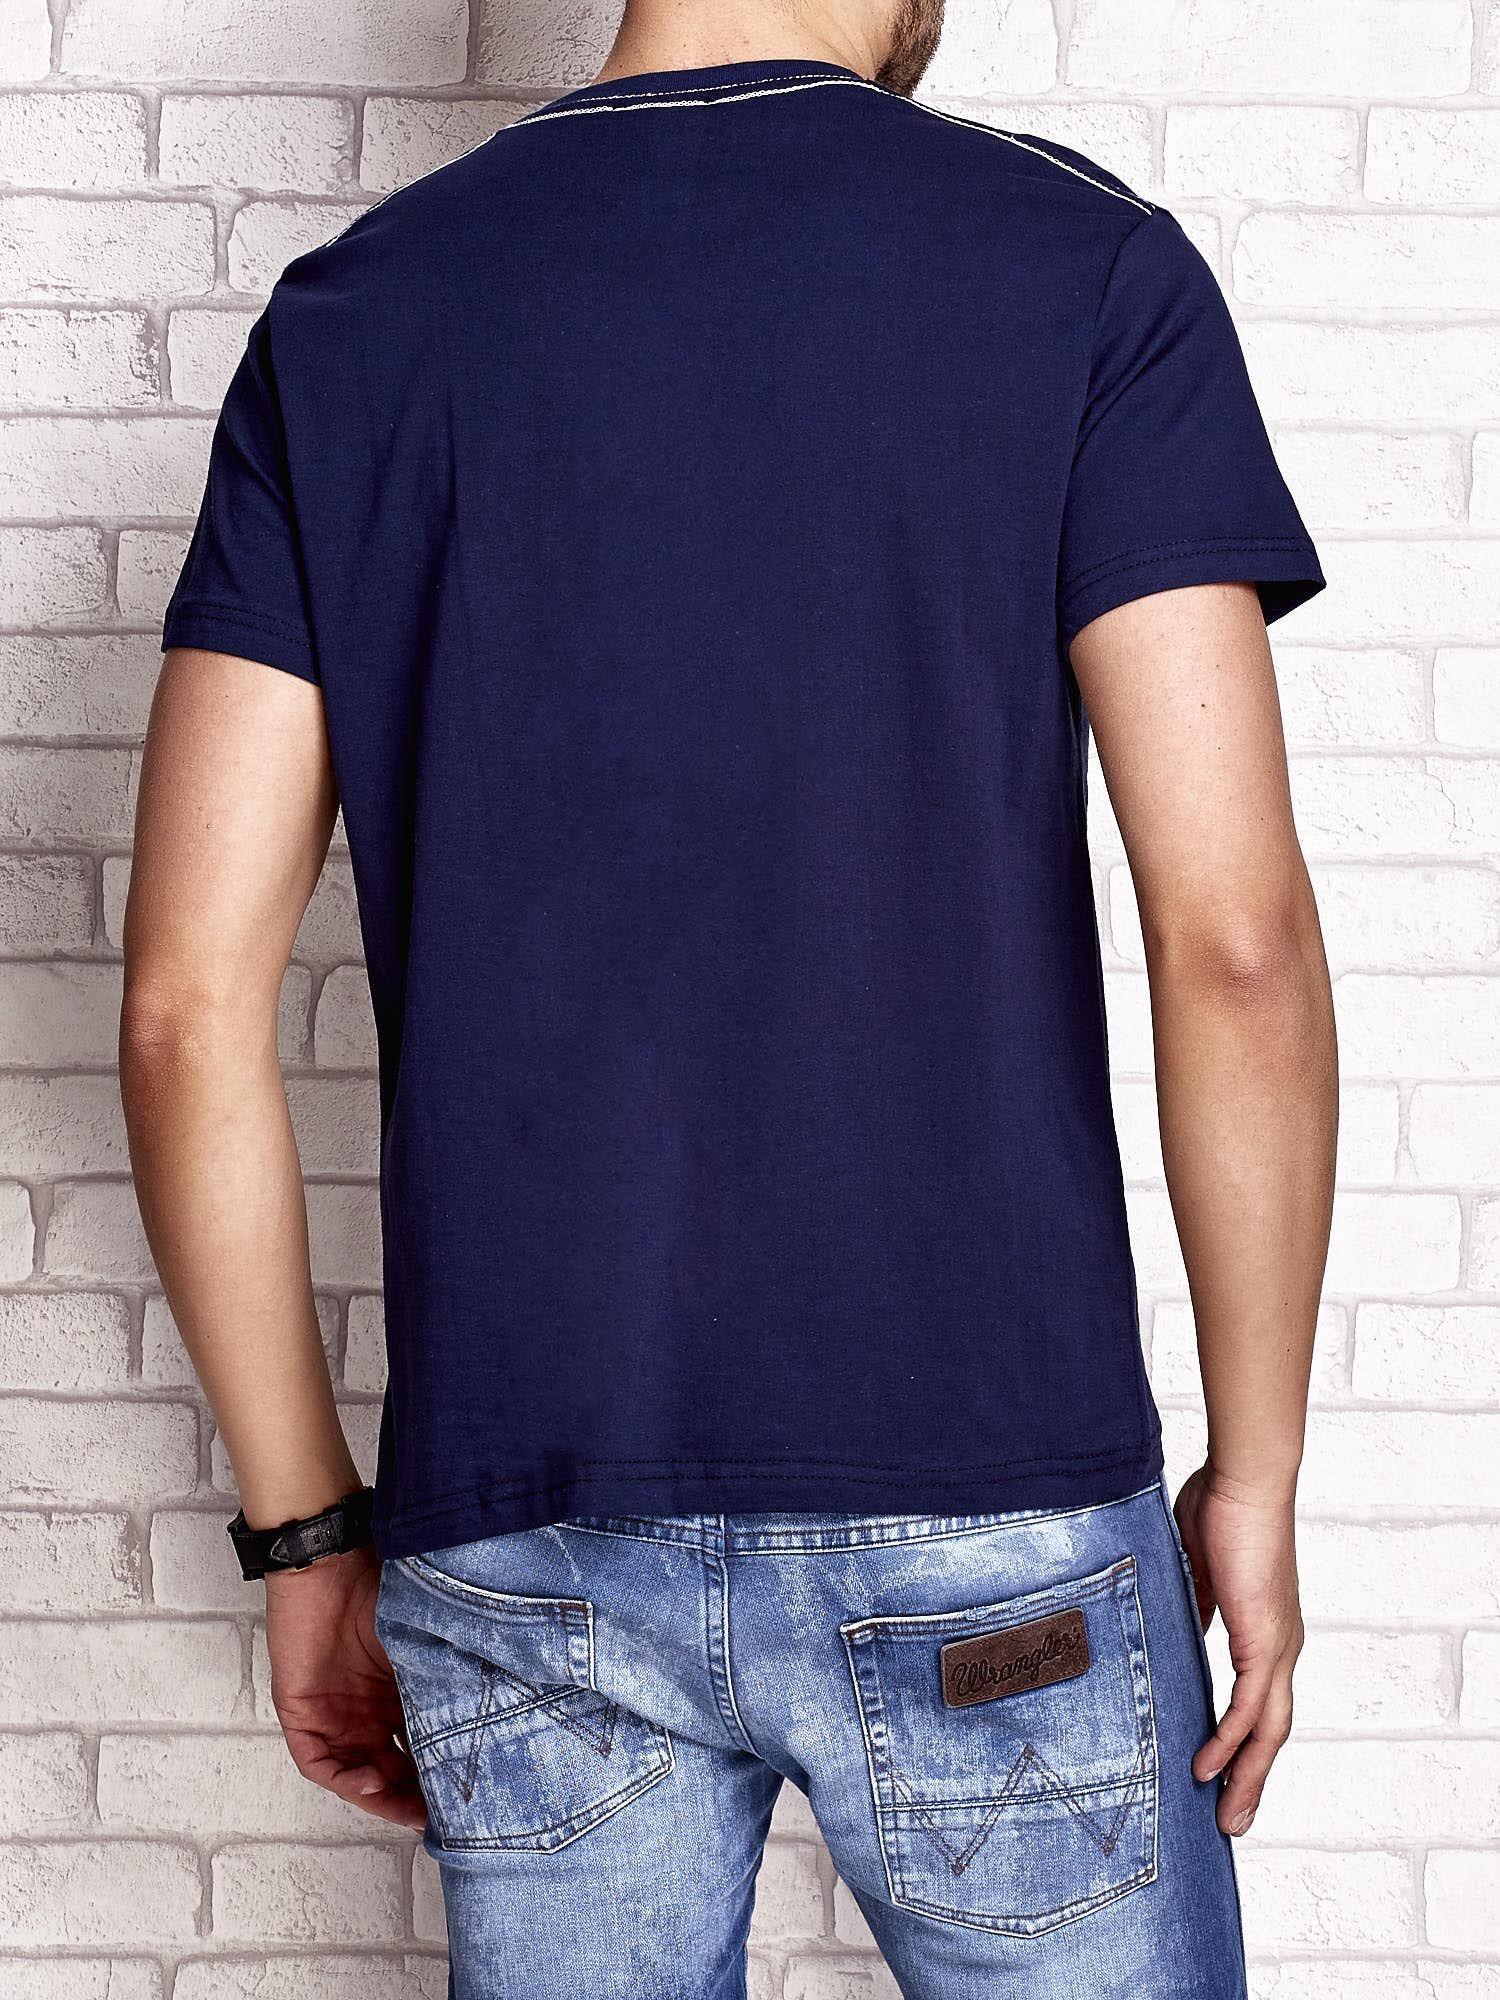 Granatowy t-shirt męski z napisem BROOKLYN NYC                                  zdj.                                  2